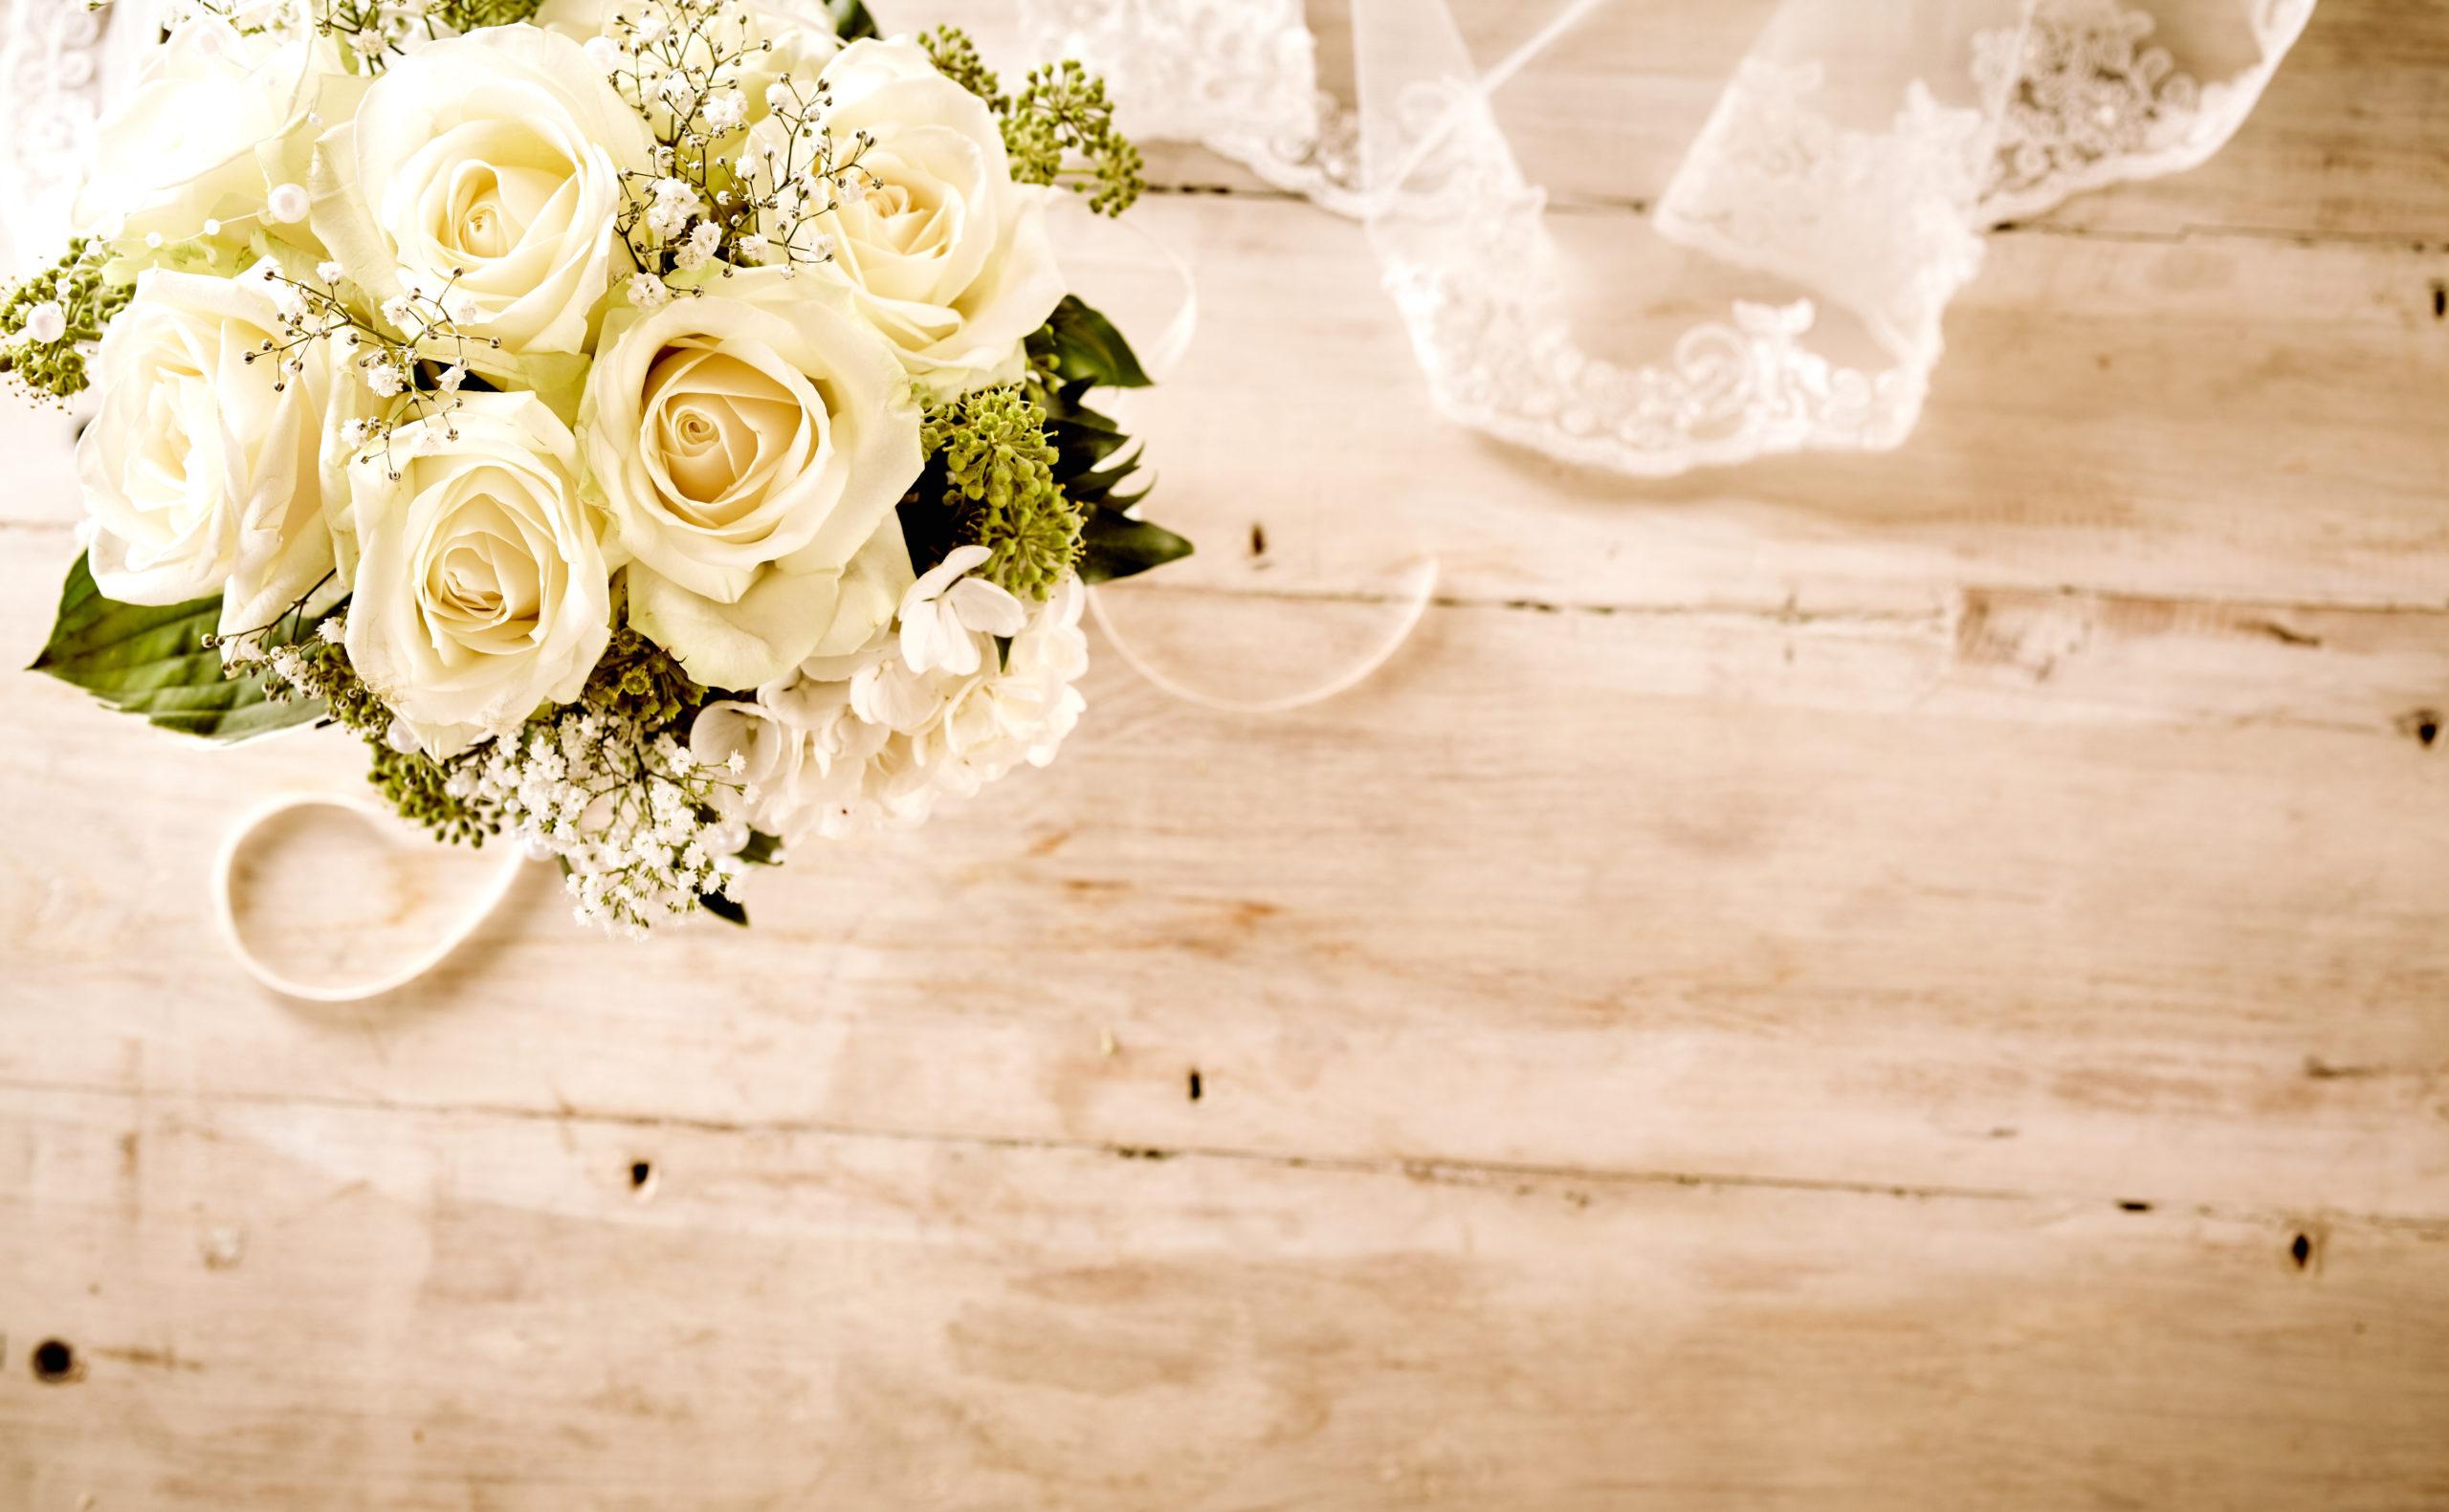 high-angle-still-life-bridal-bouquet-483615781